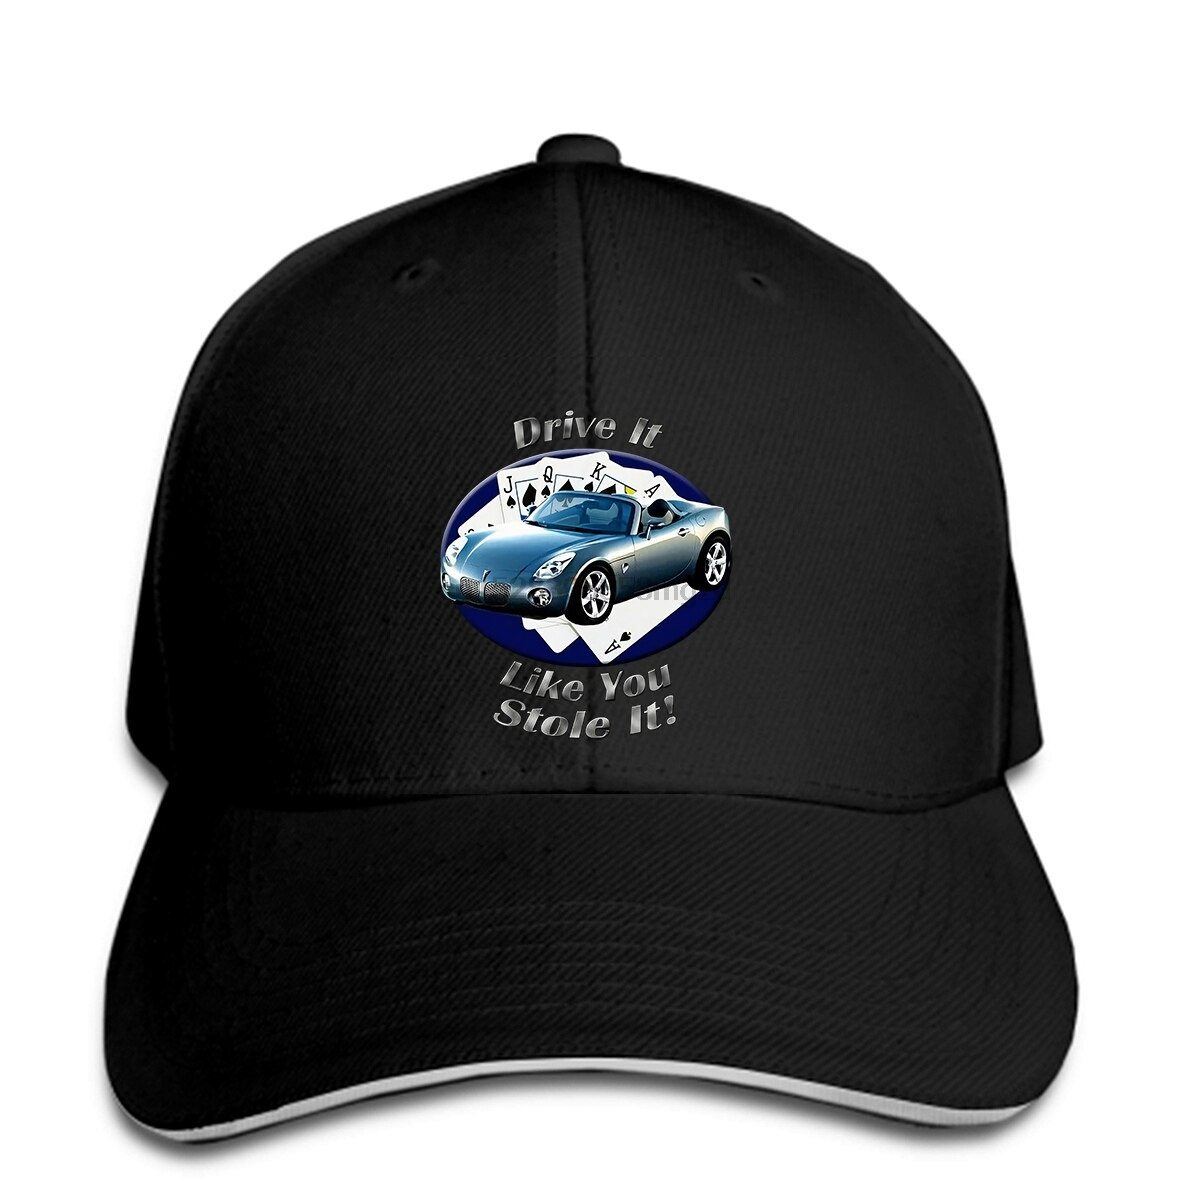 Pontiac Solstice Drive It Mens Dark Men gorra de béisbol gorra Snapback mujeres sombrero pico